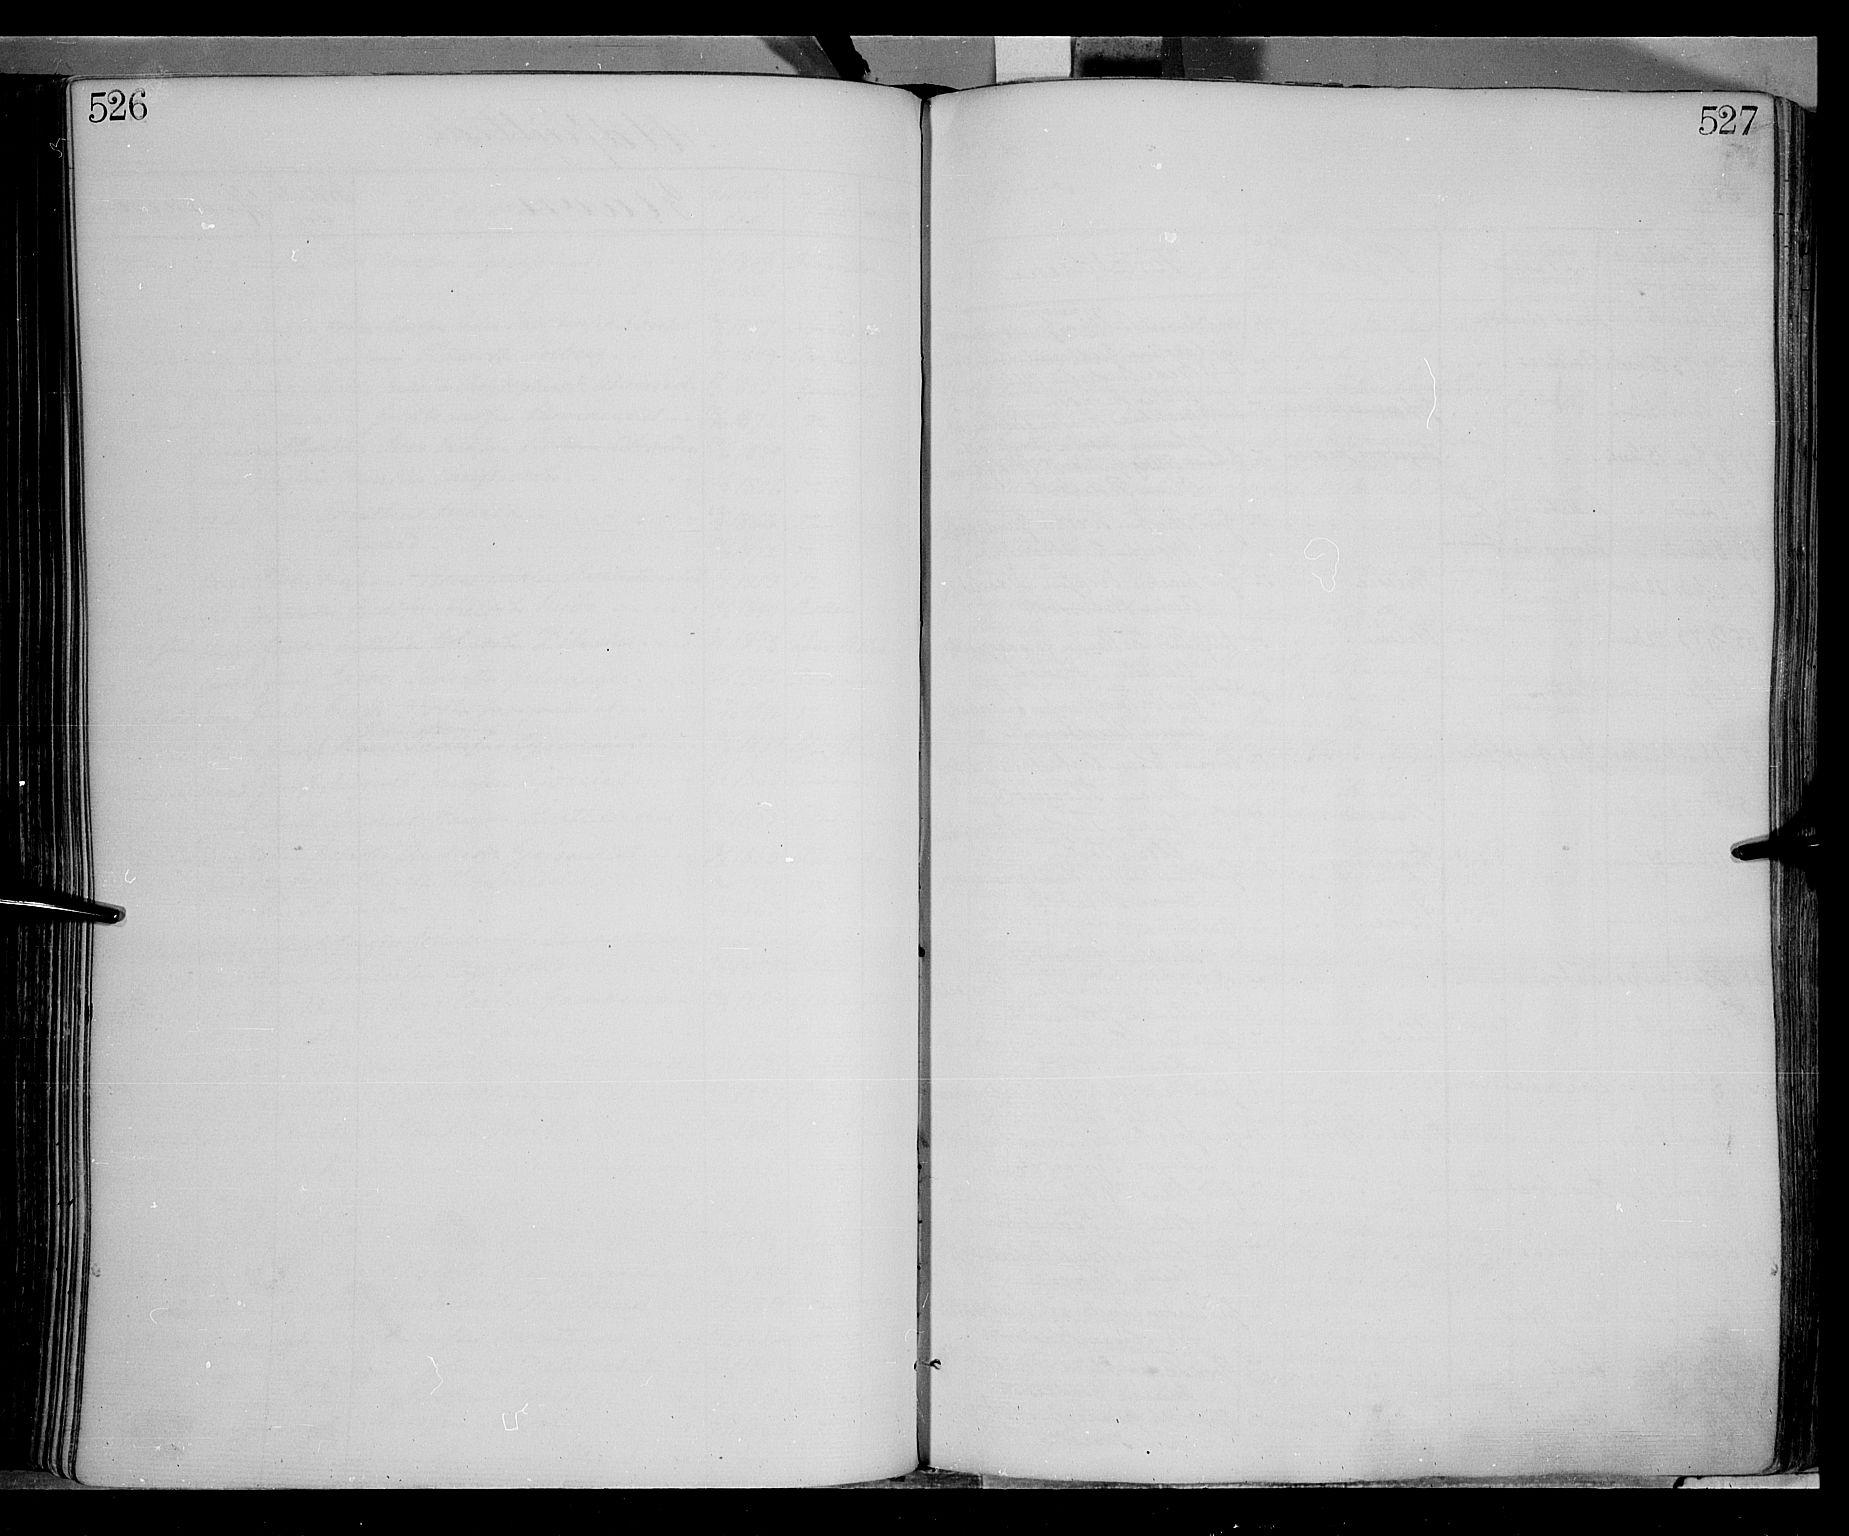 SAH, Gran prestekontor, Ministerialbok nr. 12, 1856-1874, s. 526-527